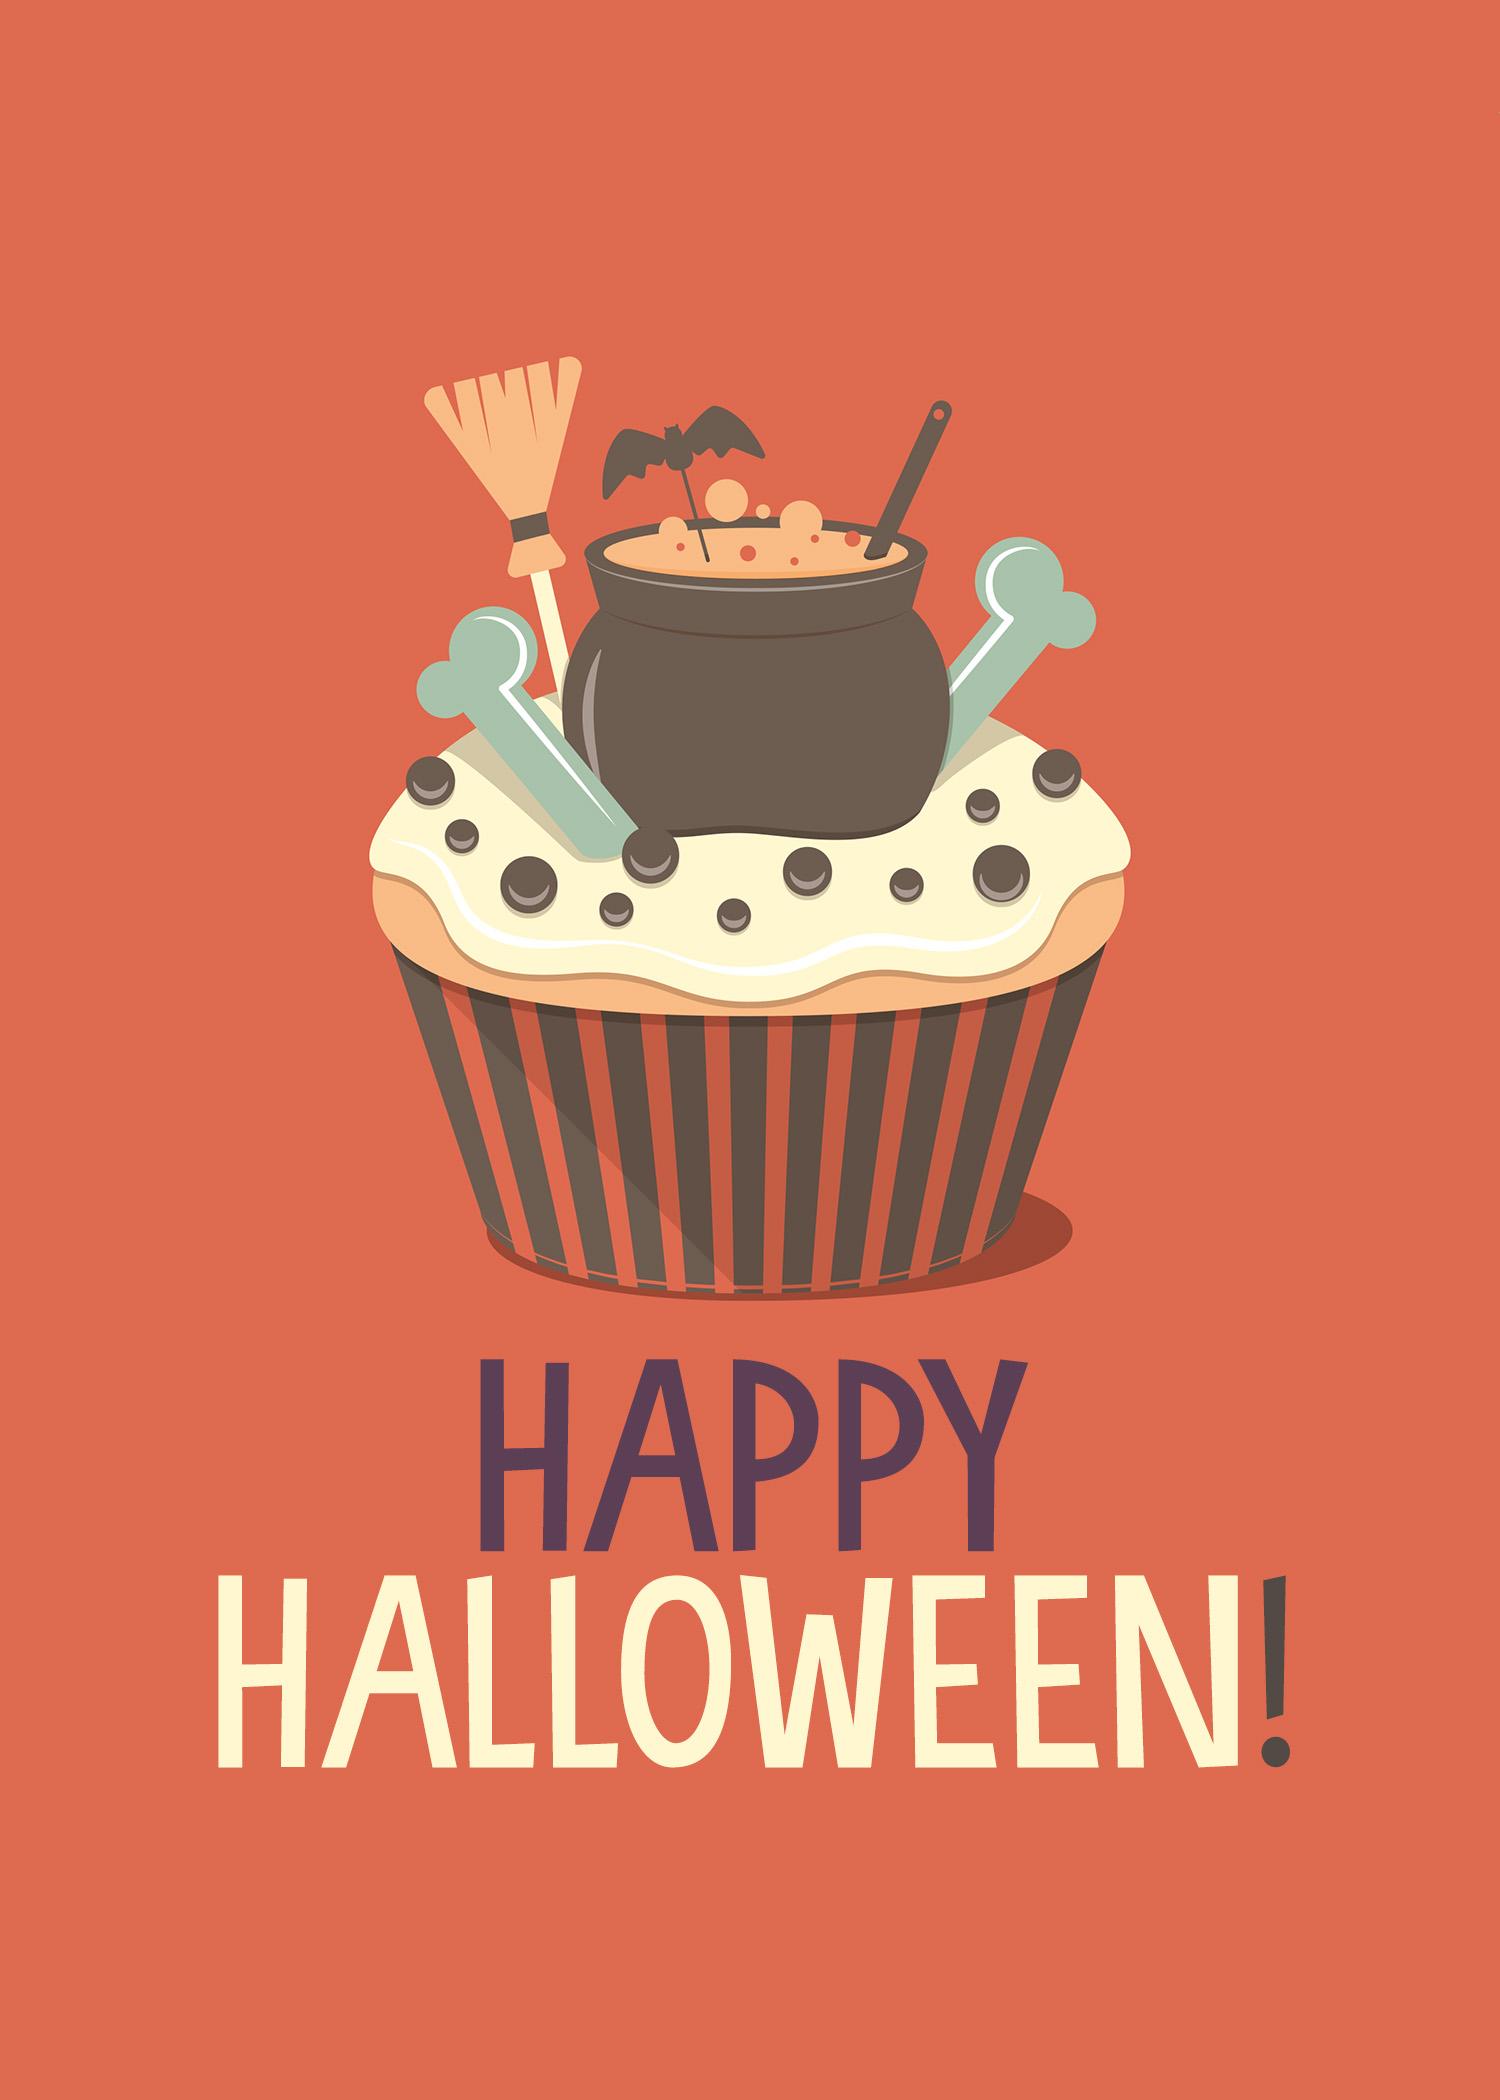 TCM-Halloween-Cupcake-5x-7-1